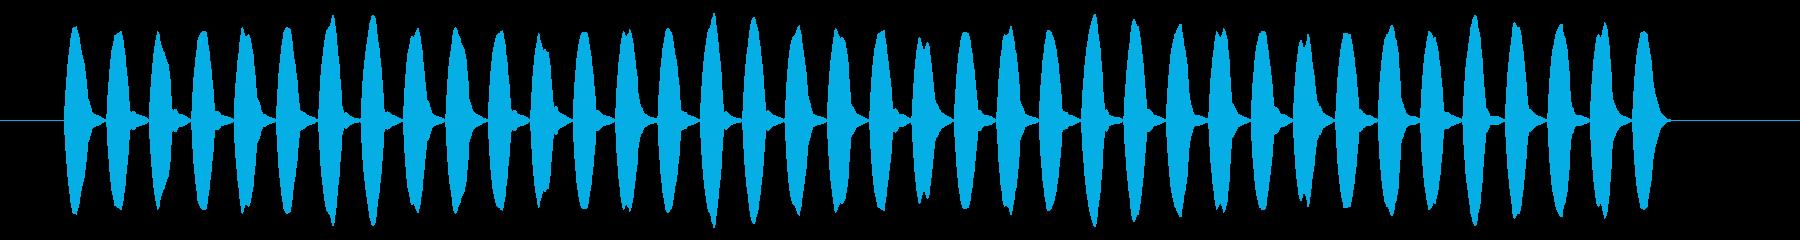 SNES 格闘05-12(スコア)の再生済みの波形